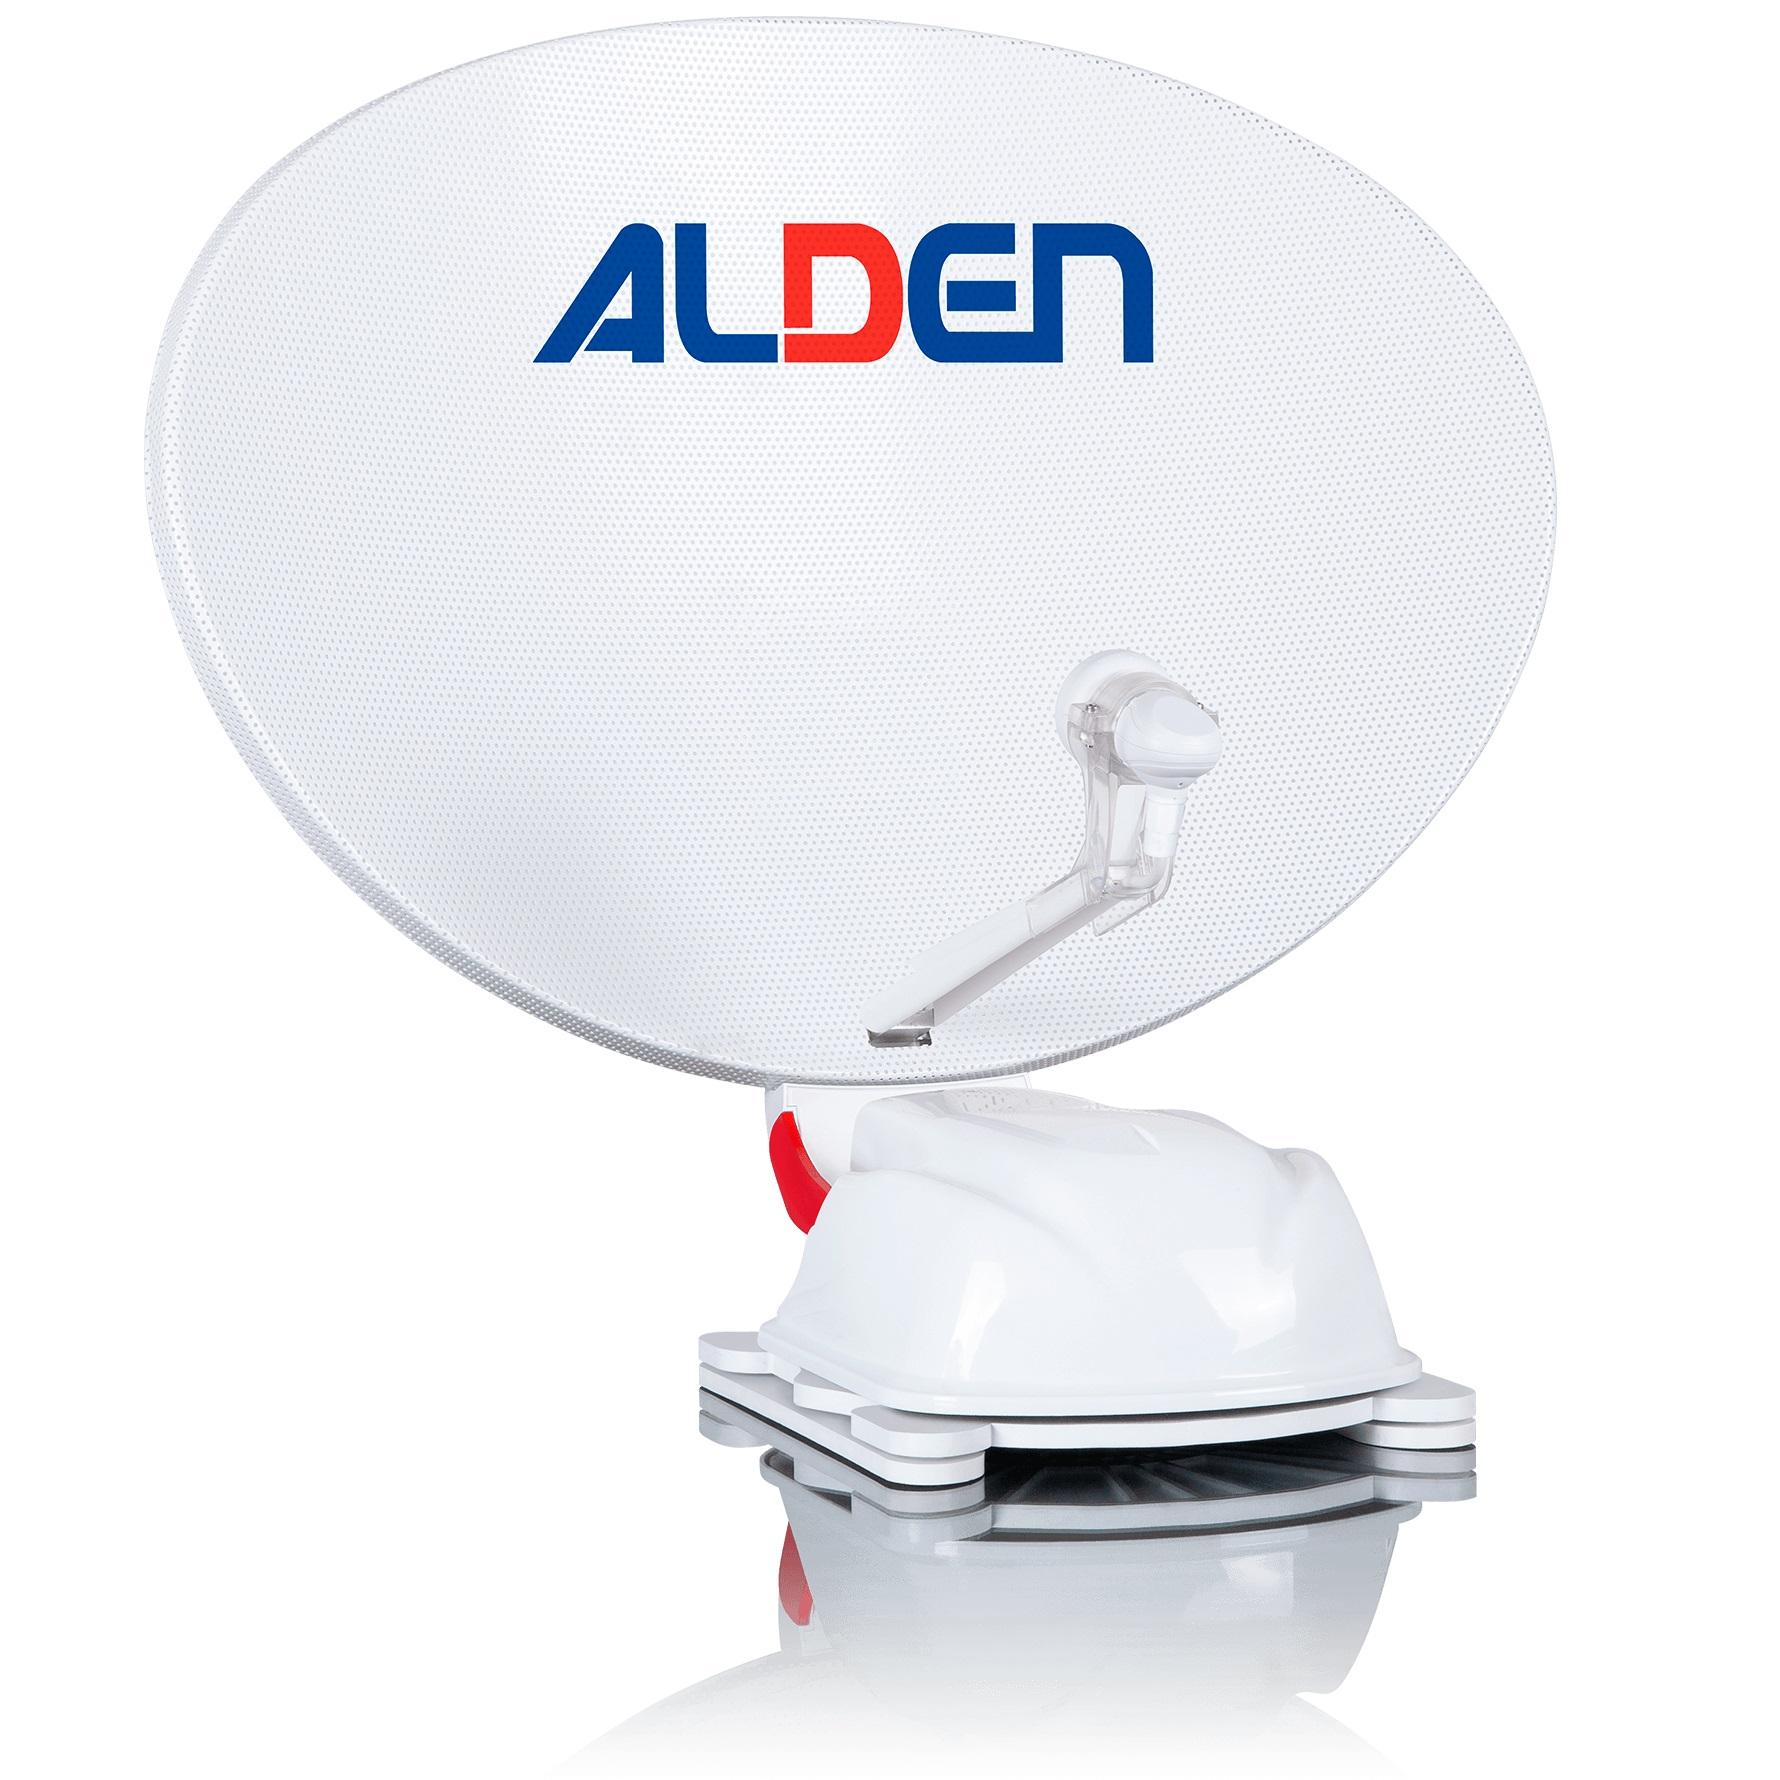 ALDEN AS2 80 HD Ultrawhite